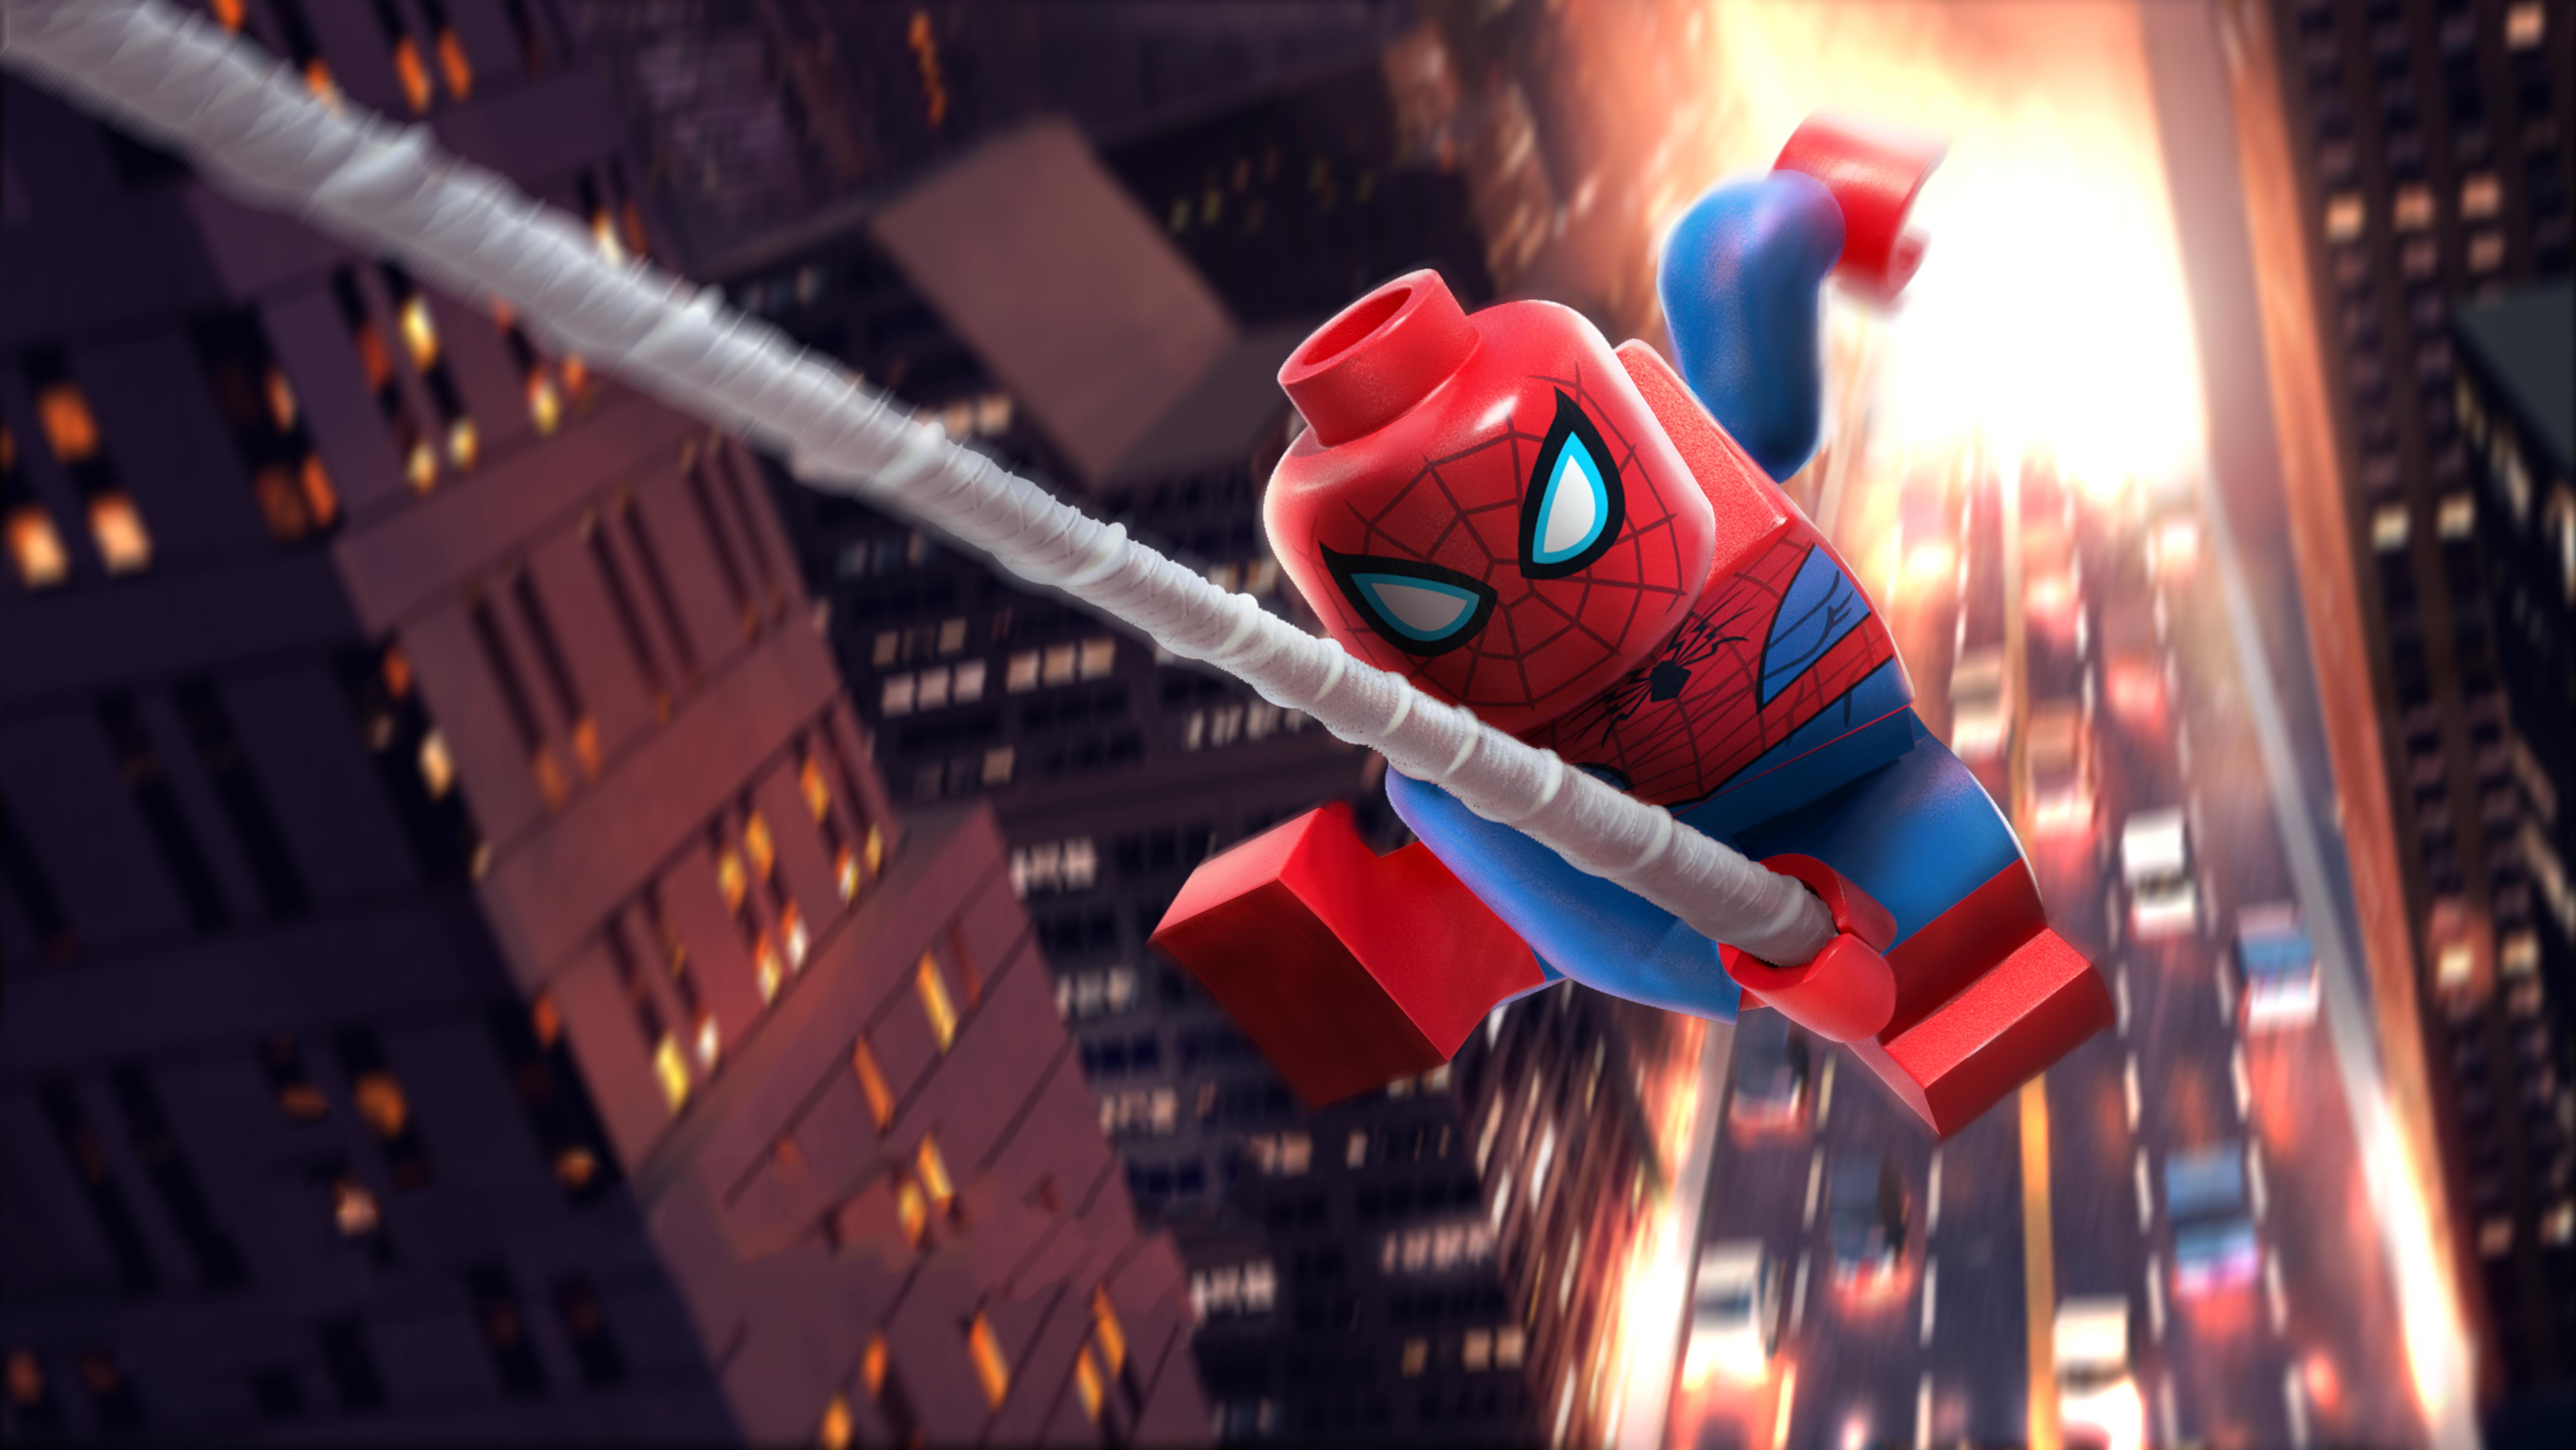 Lego Spider Man Vexed By Venom 5k Retina Ultra Hd Wallpaper